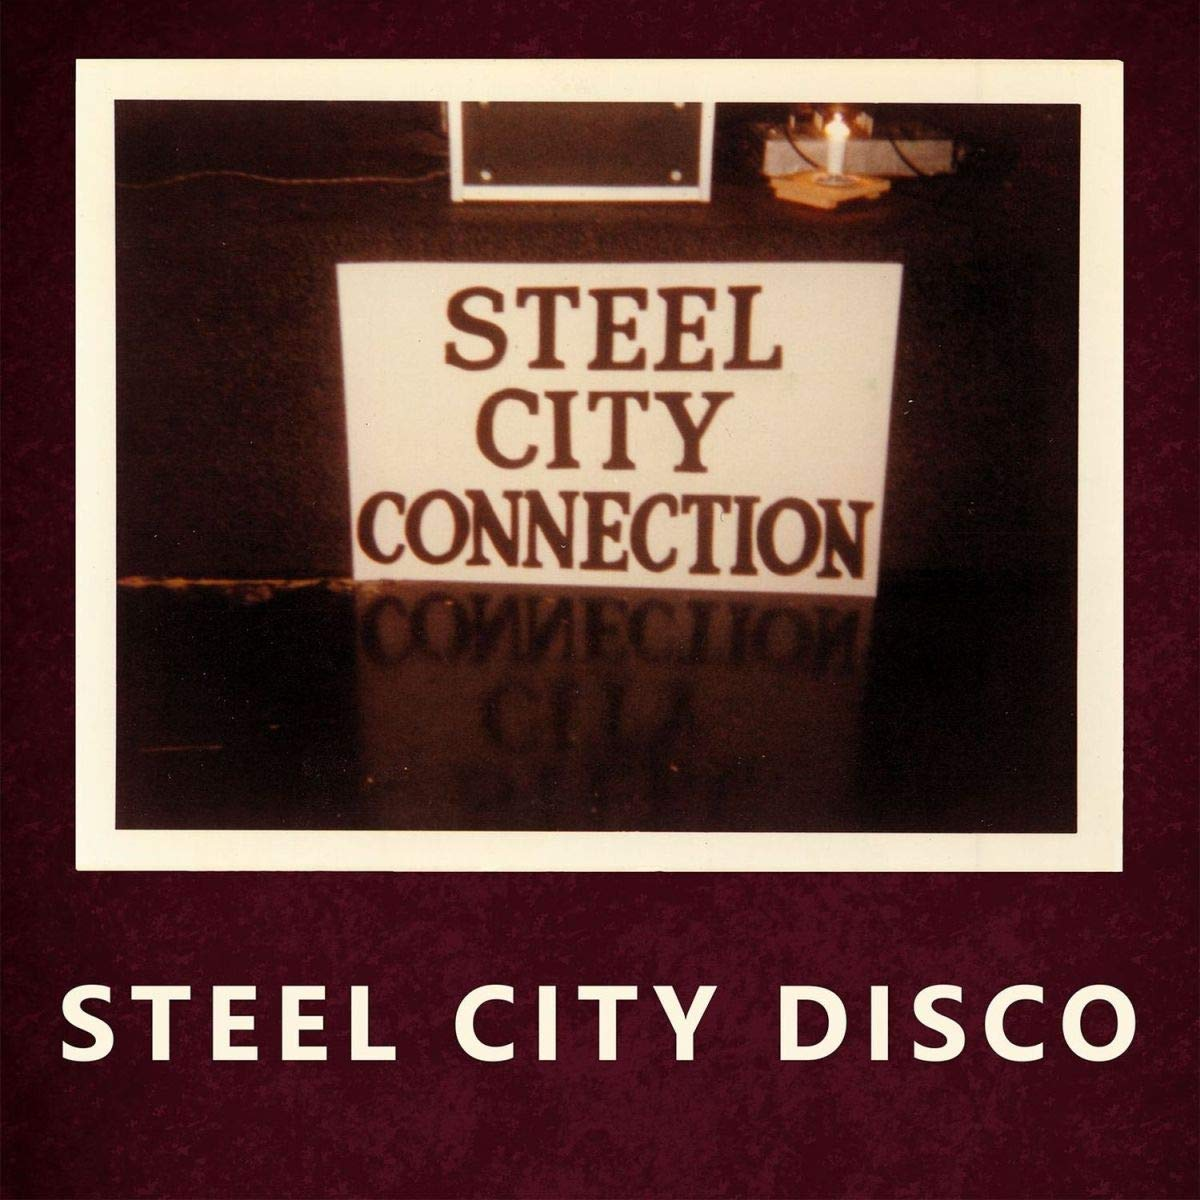 Vinilo : Steel City Connection - Steel City Disco (United Kingdom - Import)